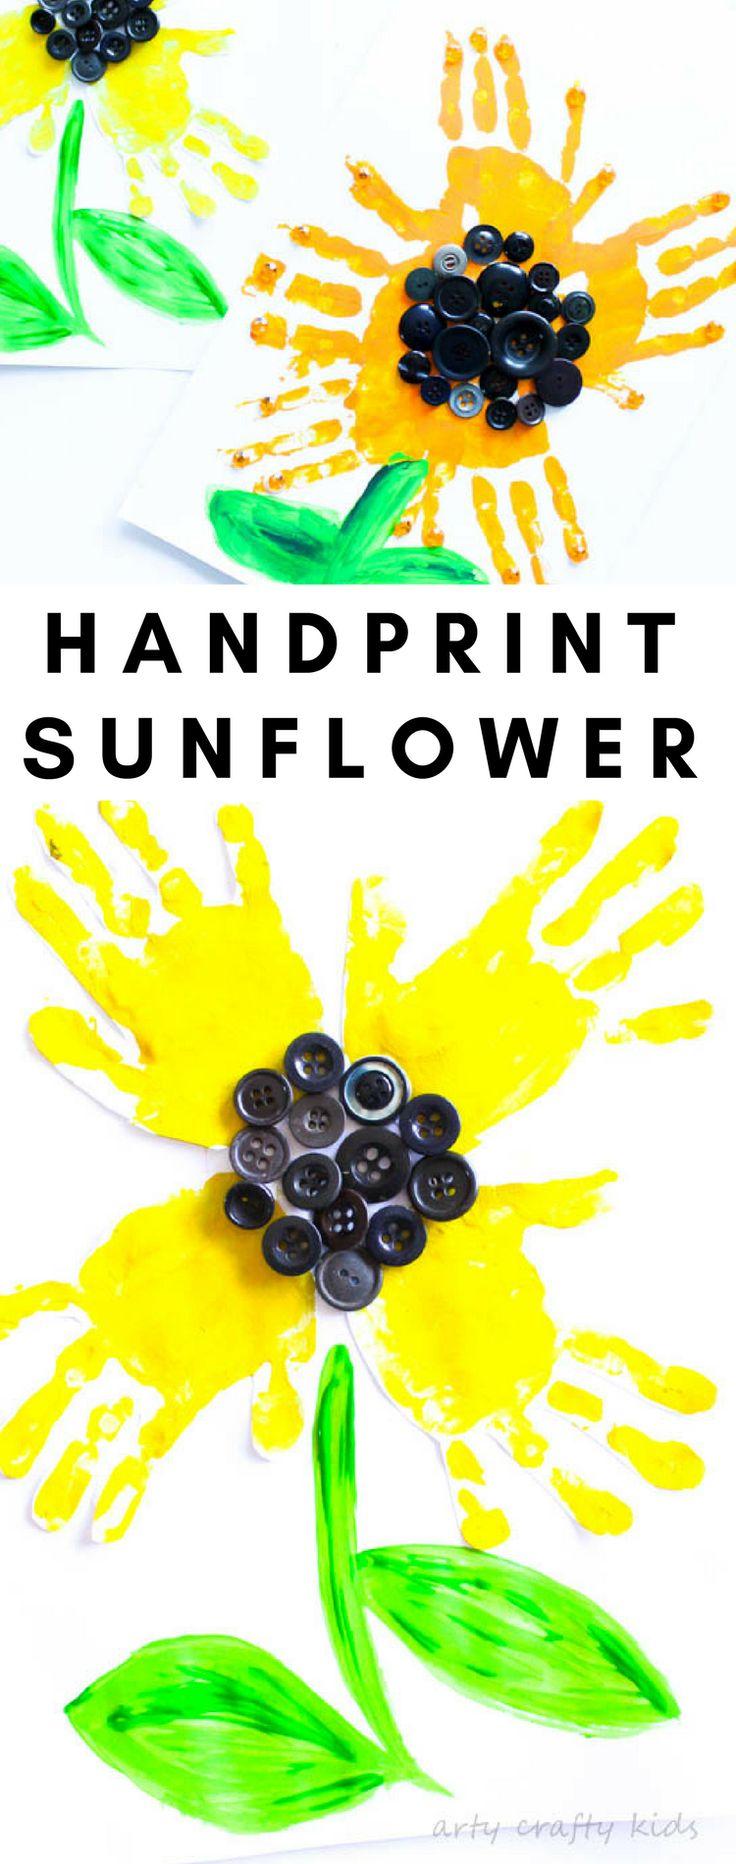 Arty Crafty Kids | Art | Easy Handprint Sunflower Craft | A super cute sunflower handprint craft for kids!